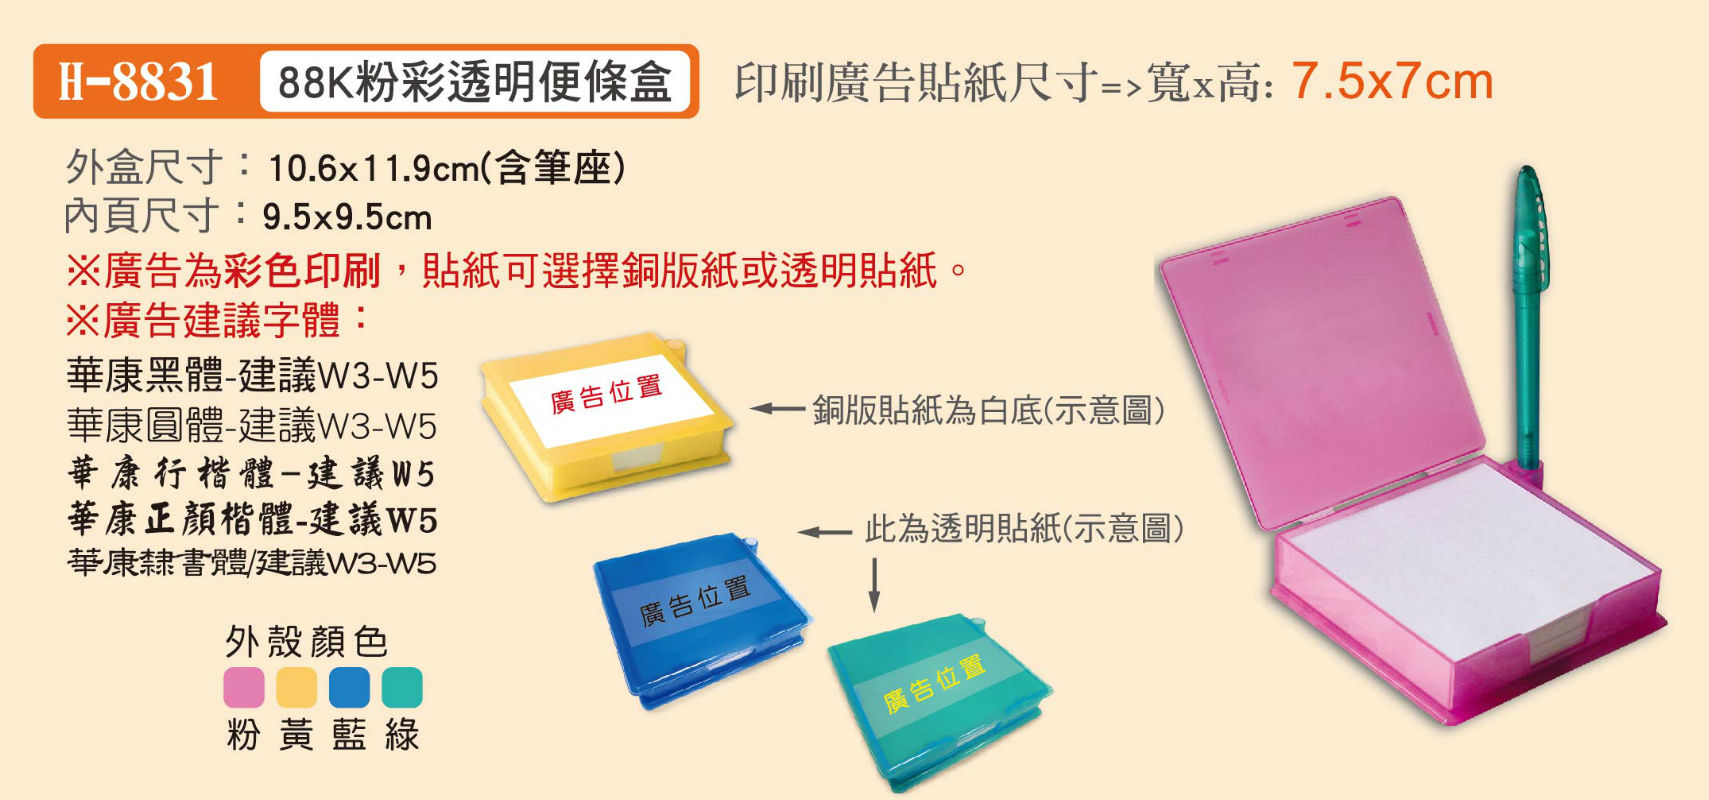 NHH-8831 88K粉彩透明便條盒.jpg